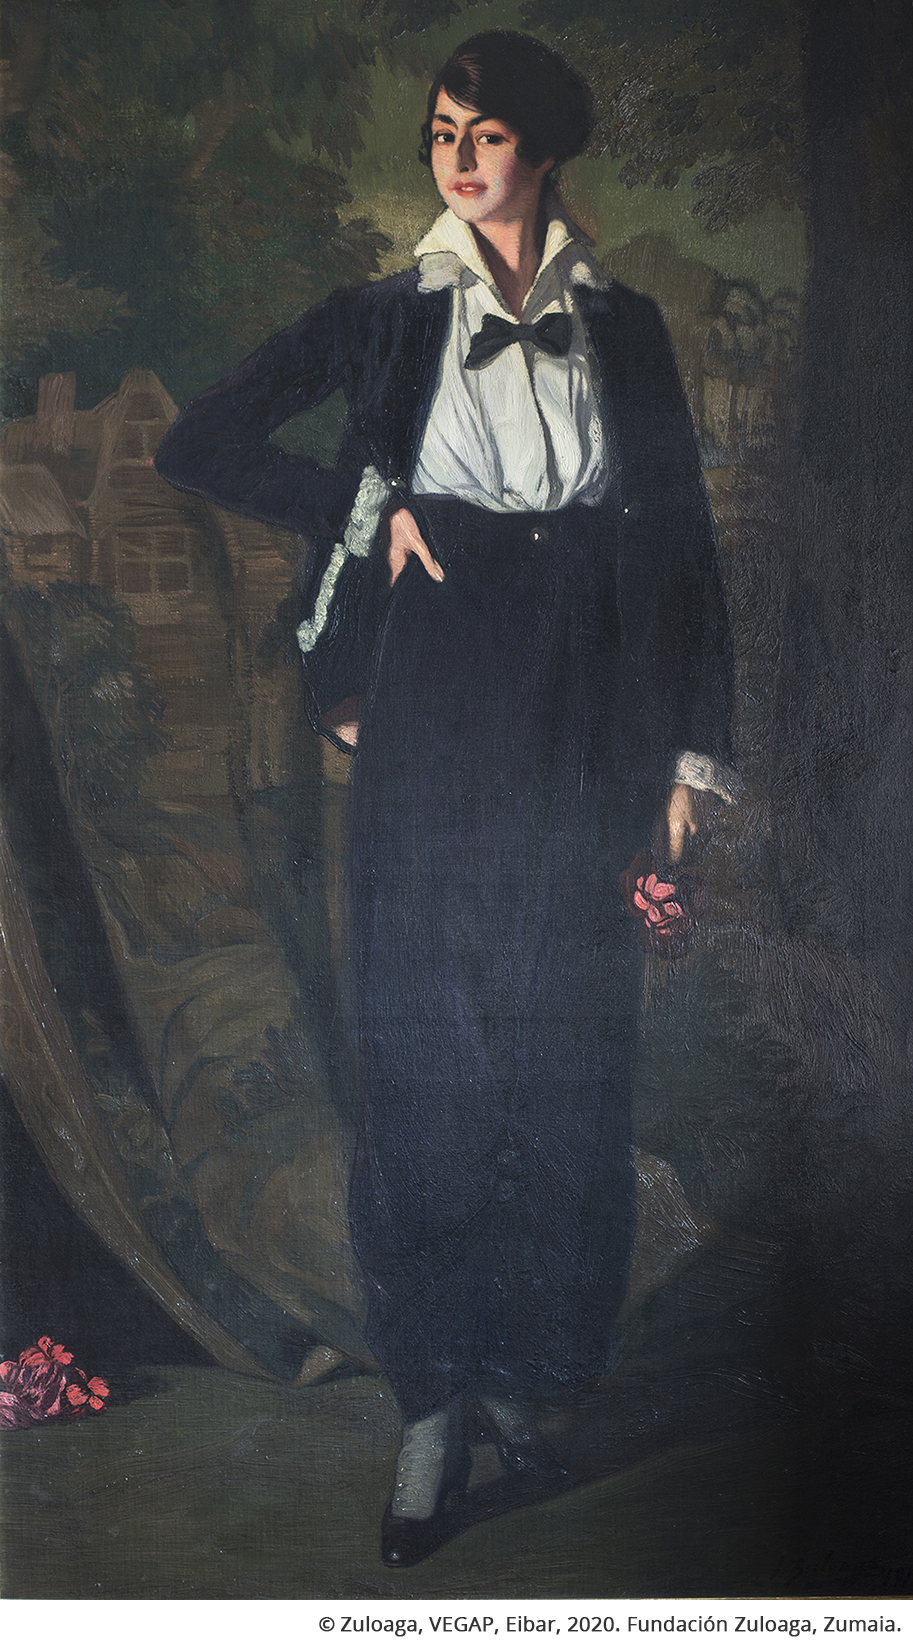 Mademoiselle Souty à la garçon